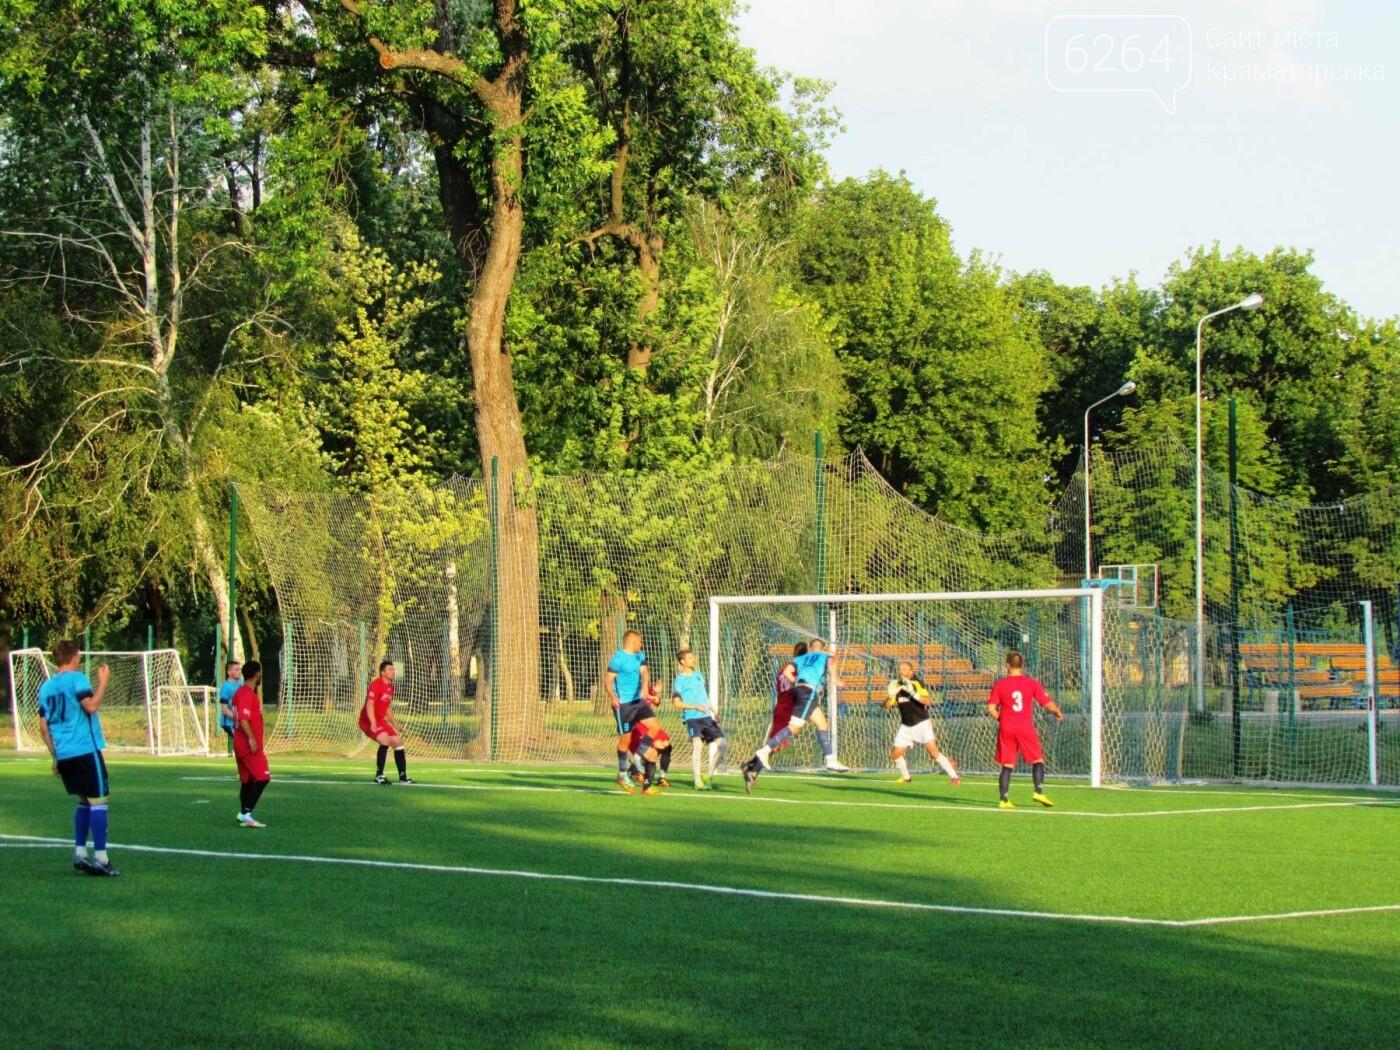 Полуфинал Кубка области по футболу прошел в Краматорске, фото-5